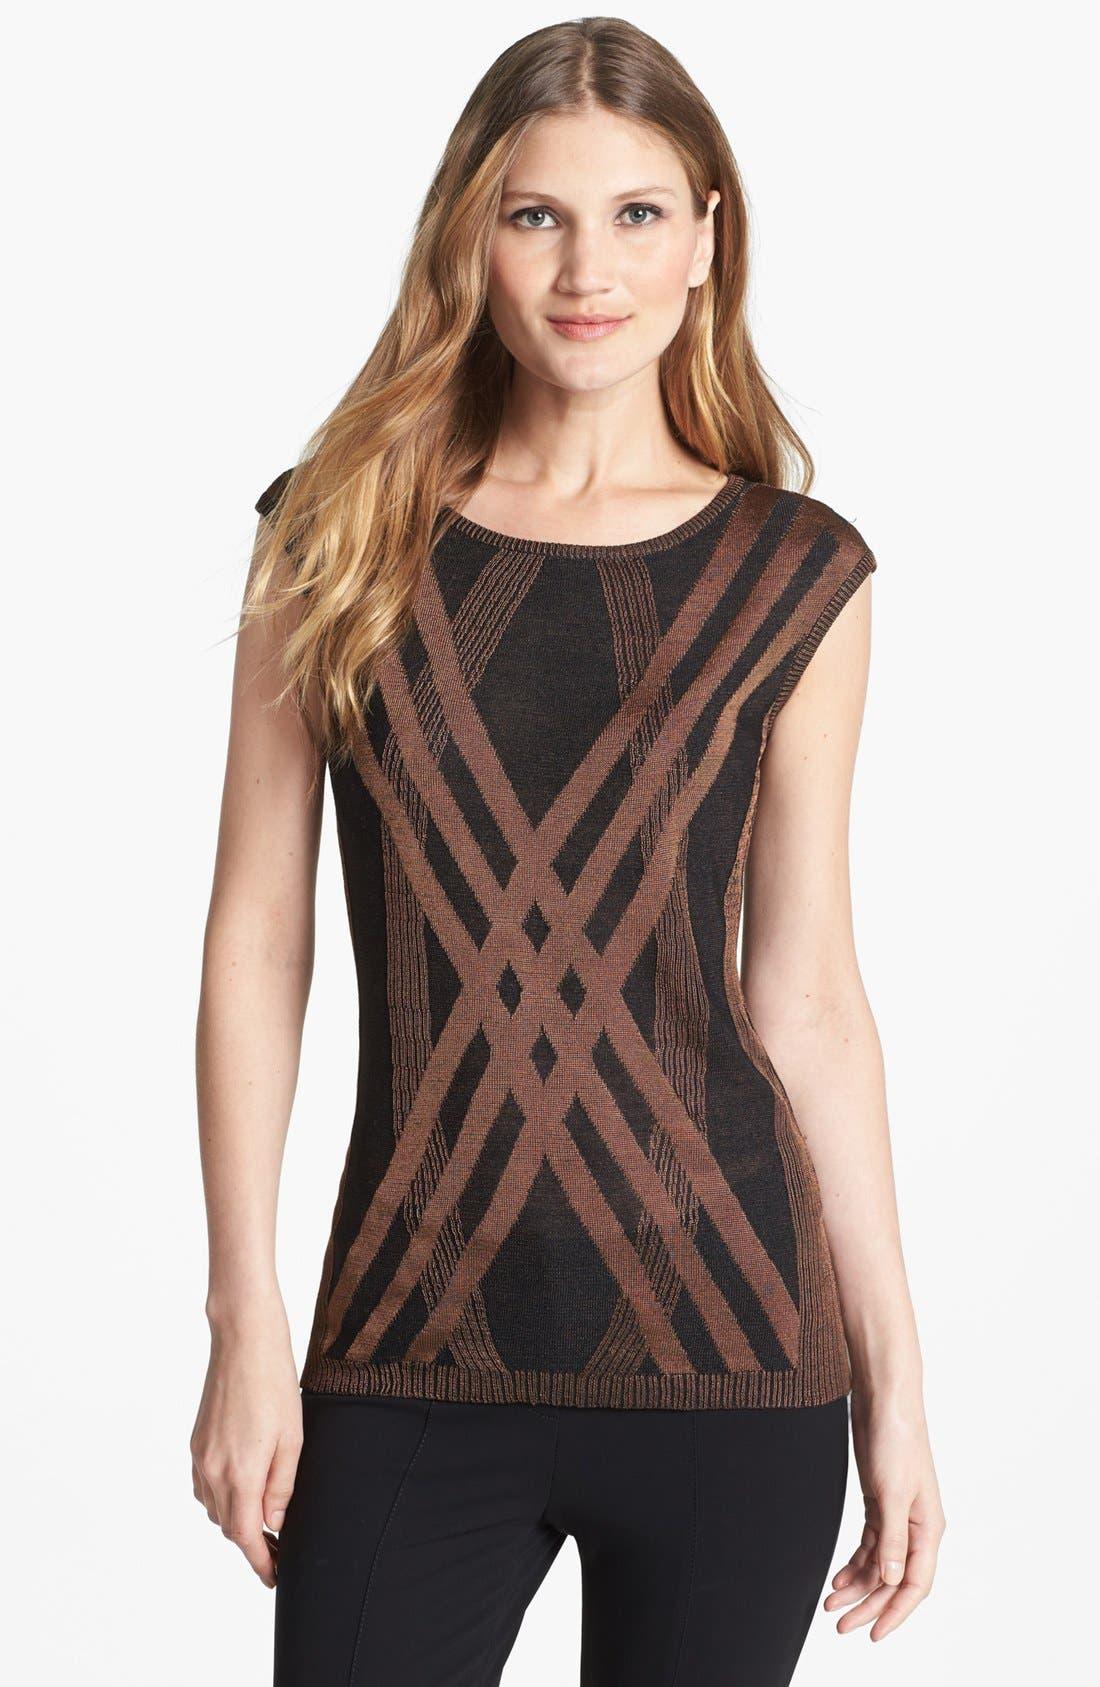 Alternate Image 1 Selected - NIC+ZOE 'Criss Cross' Silk Blend Knit Top